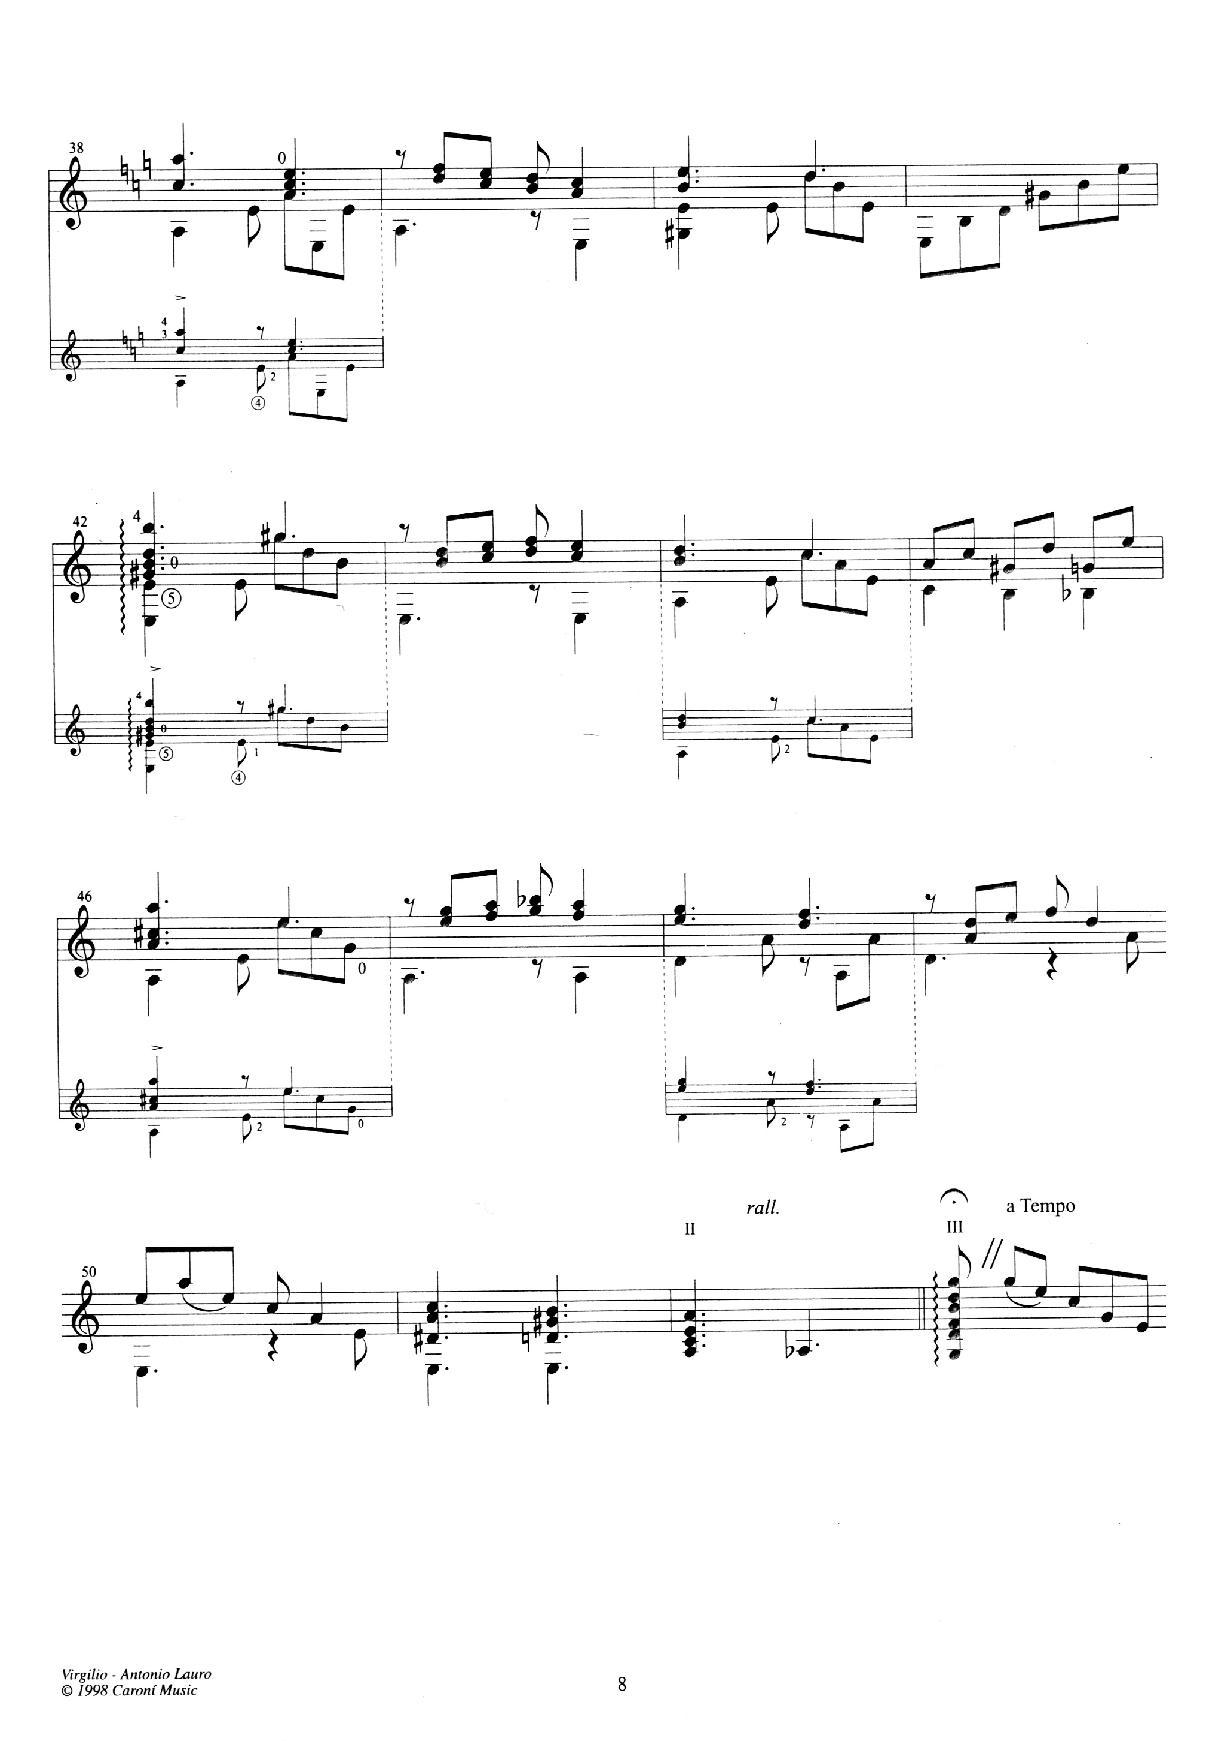 Antonio-Lauro-page-010